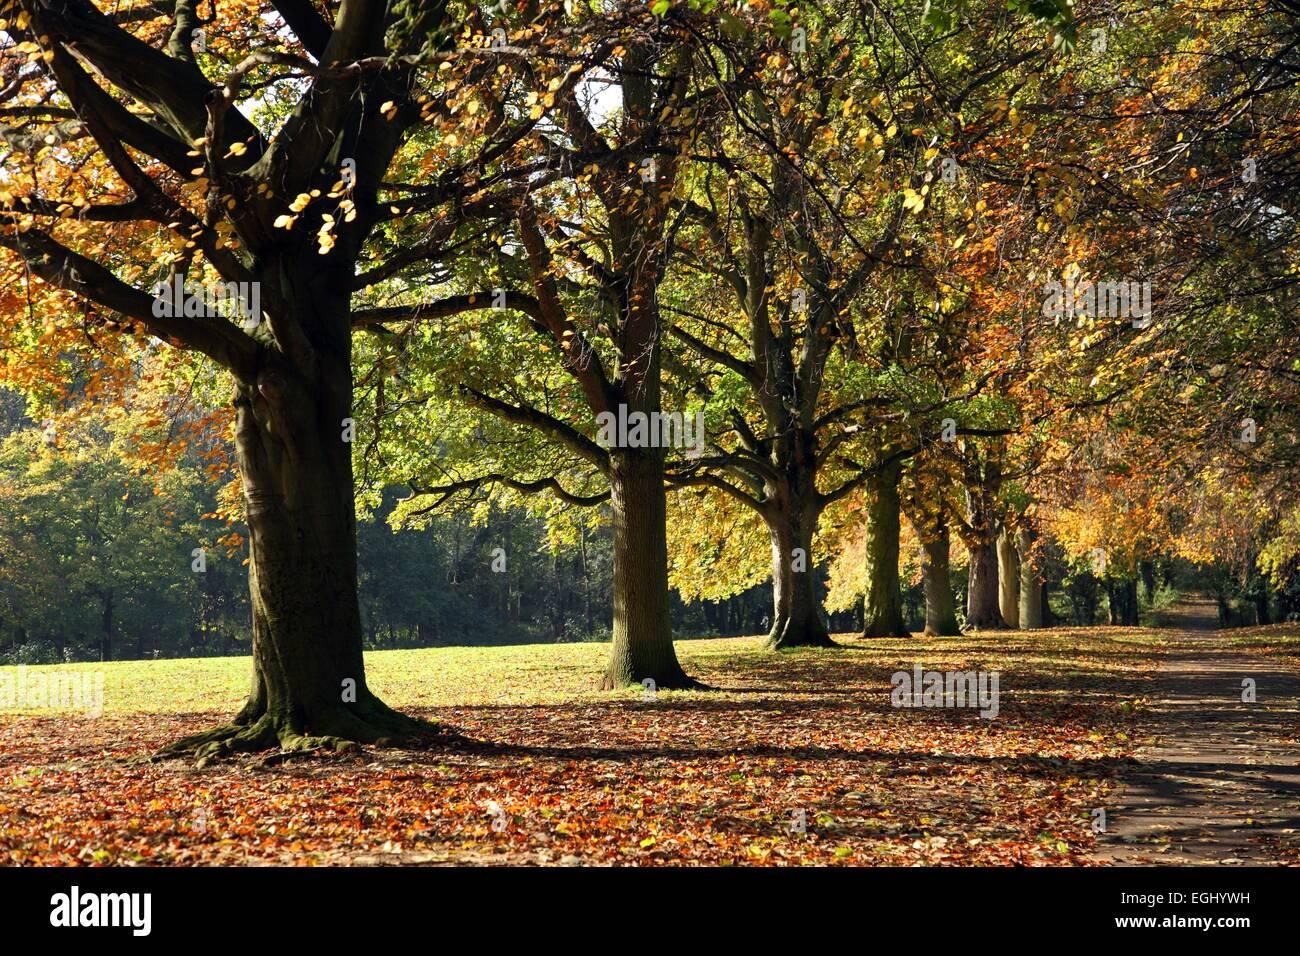 Abington Park, Weston Favell, Northampton - Stock Image